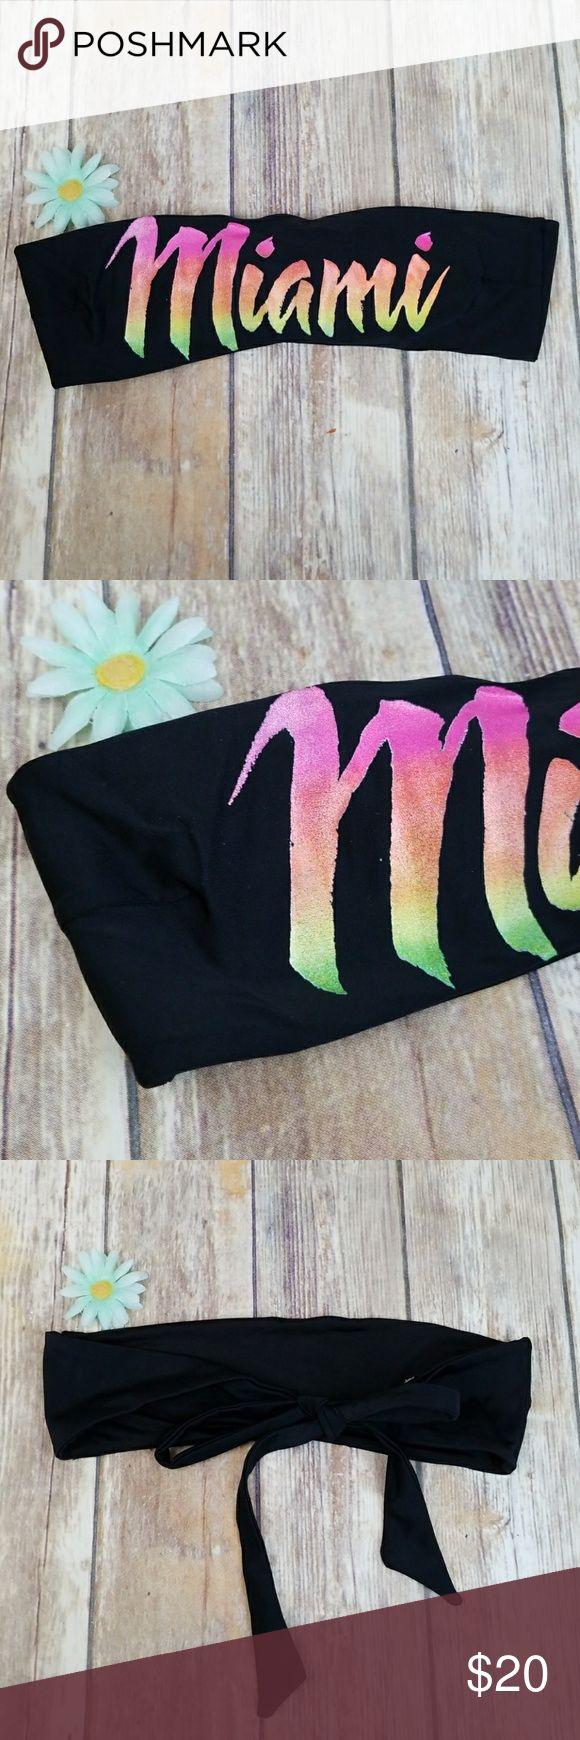 Beach riot bikini Brand new black top woth words miami just no tags Beach Riot Swim Bikinis